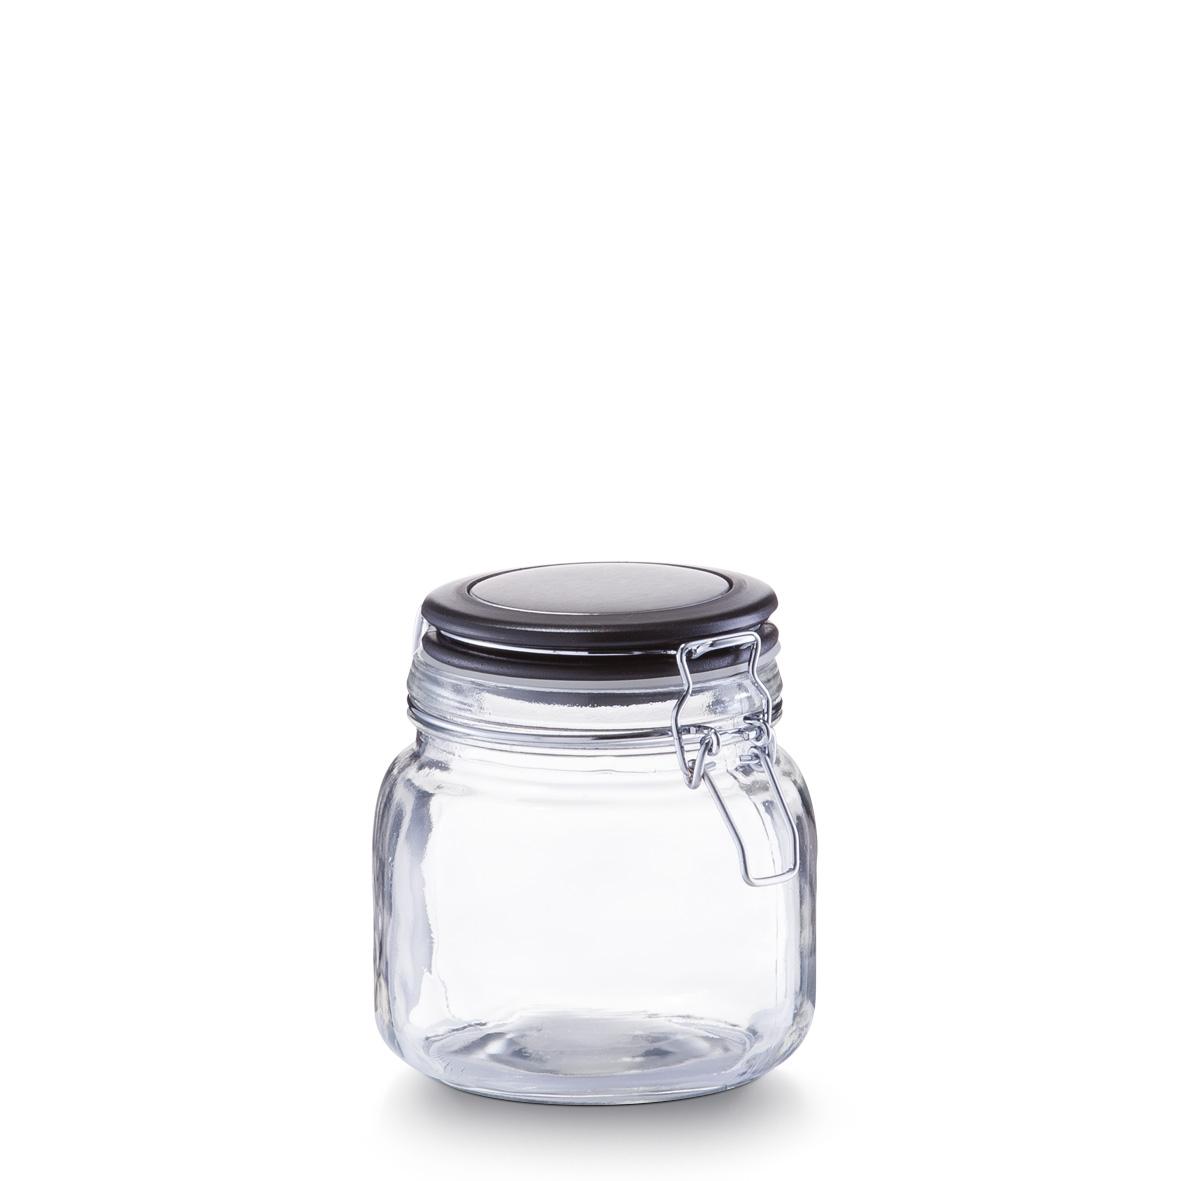 Borcan pentru depozitare cu capac, inchidere ermetica, 750 ml, l11,5xA11,5xH13 cm